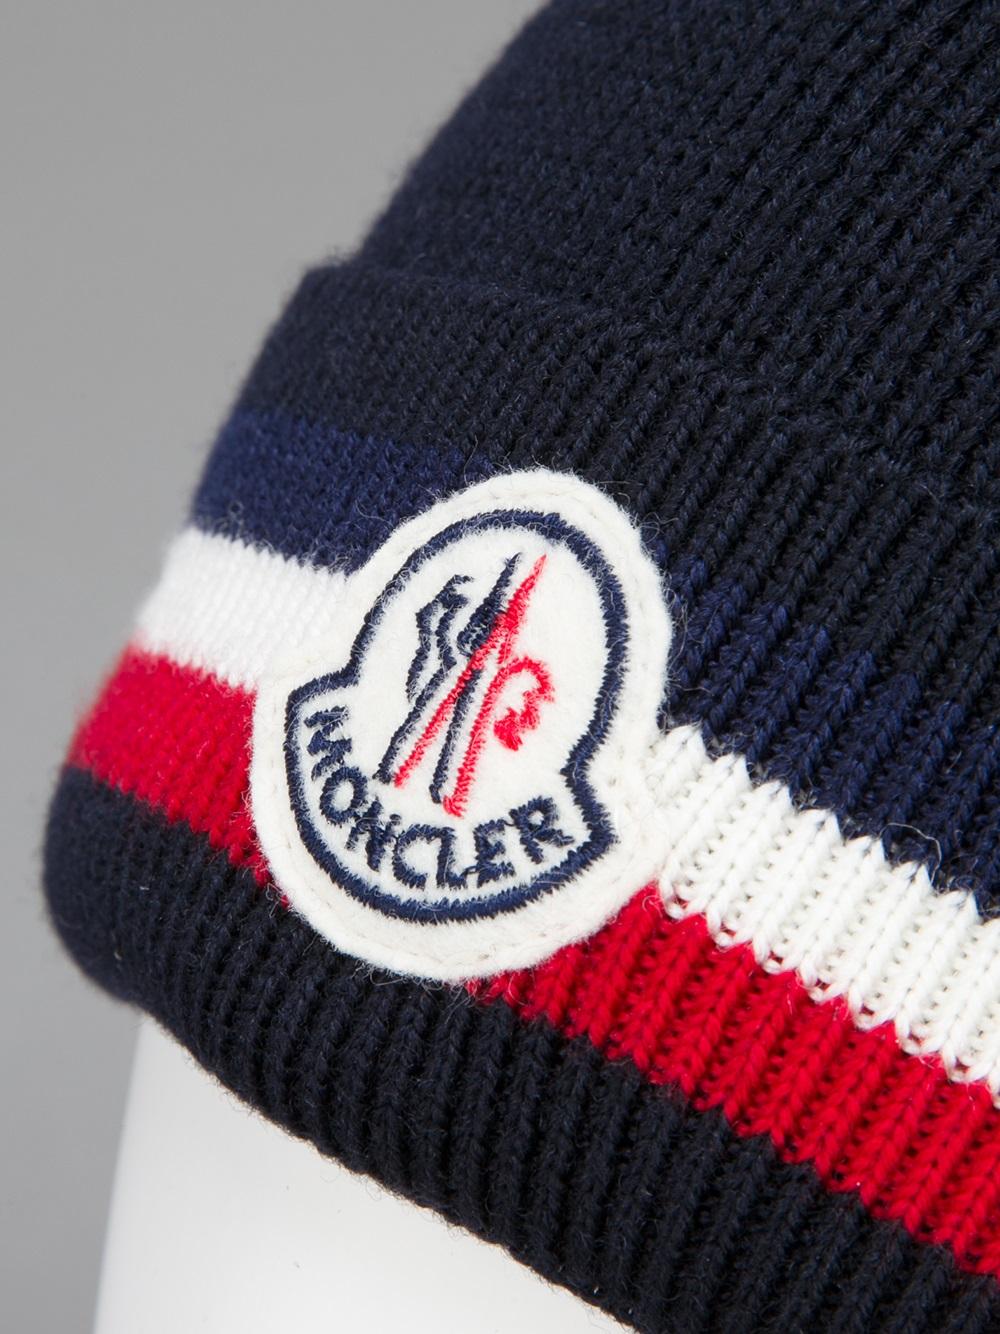 8b1b7a42a074 Lyst - Moncler Logo Beanie Hat in Blue for Men